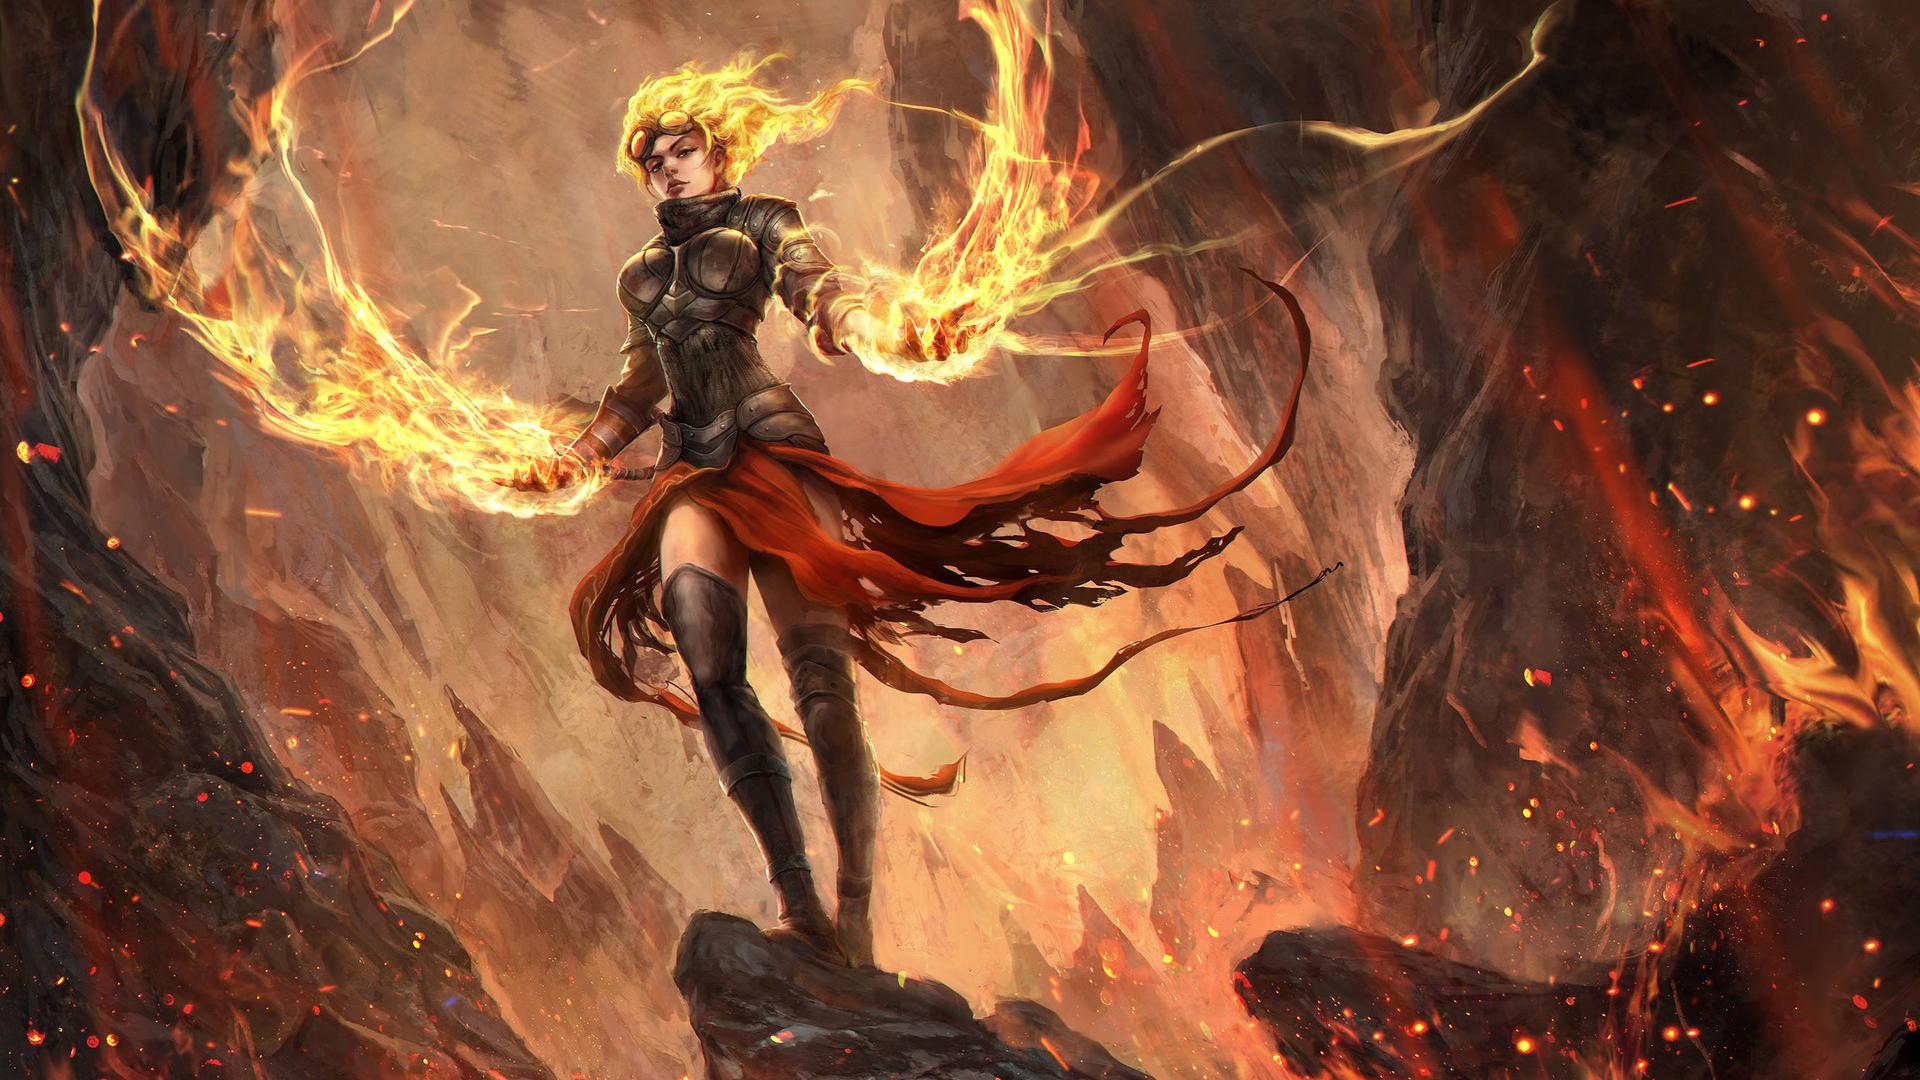 General 1920x1080 Chandra Nalaar Magic: The Gathering digital art fire